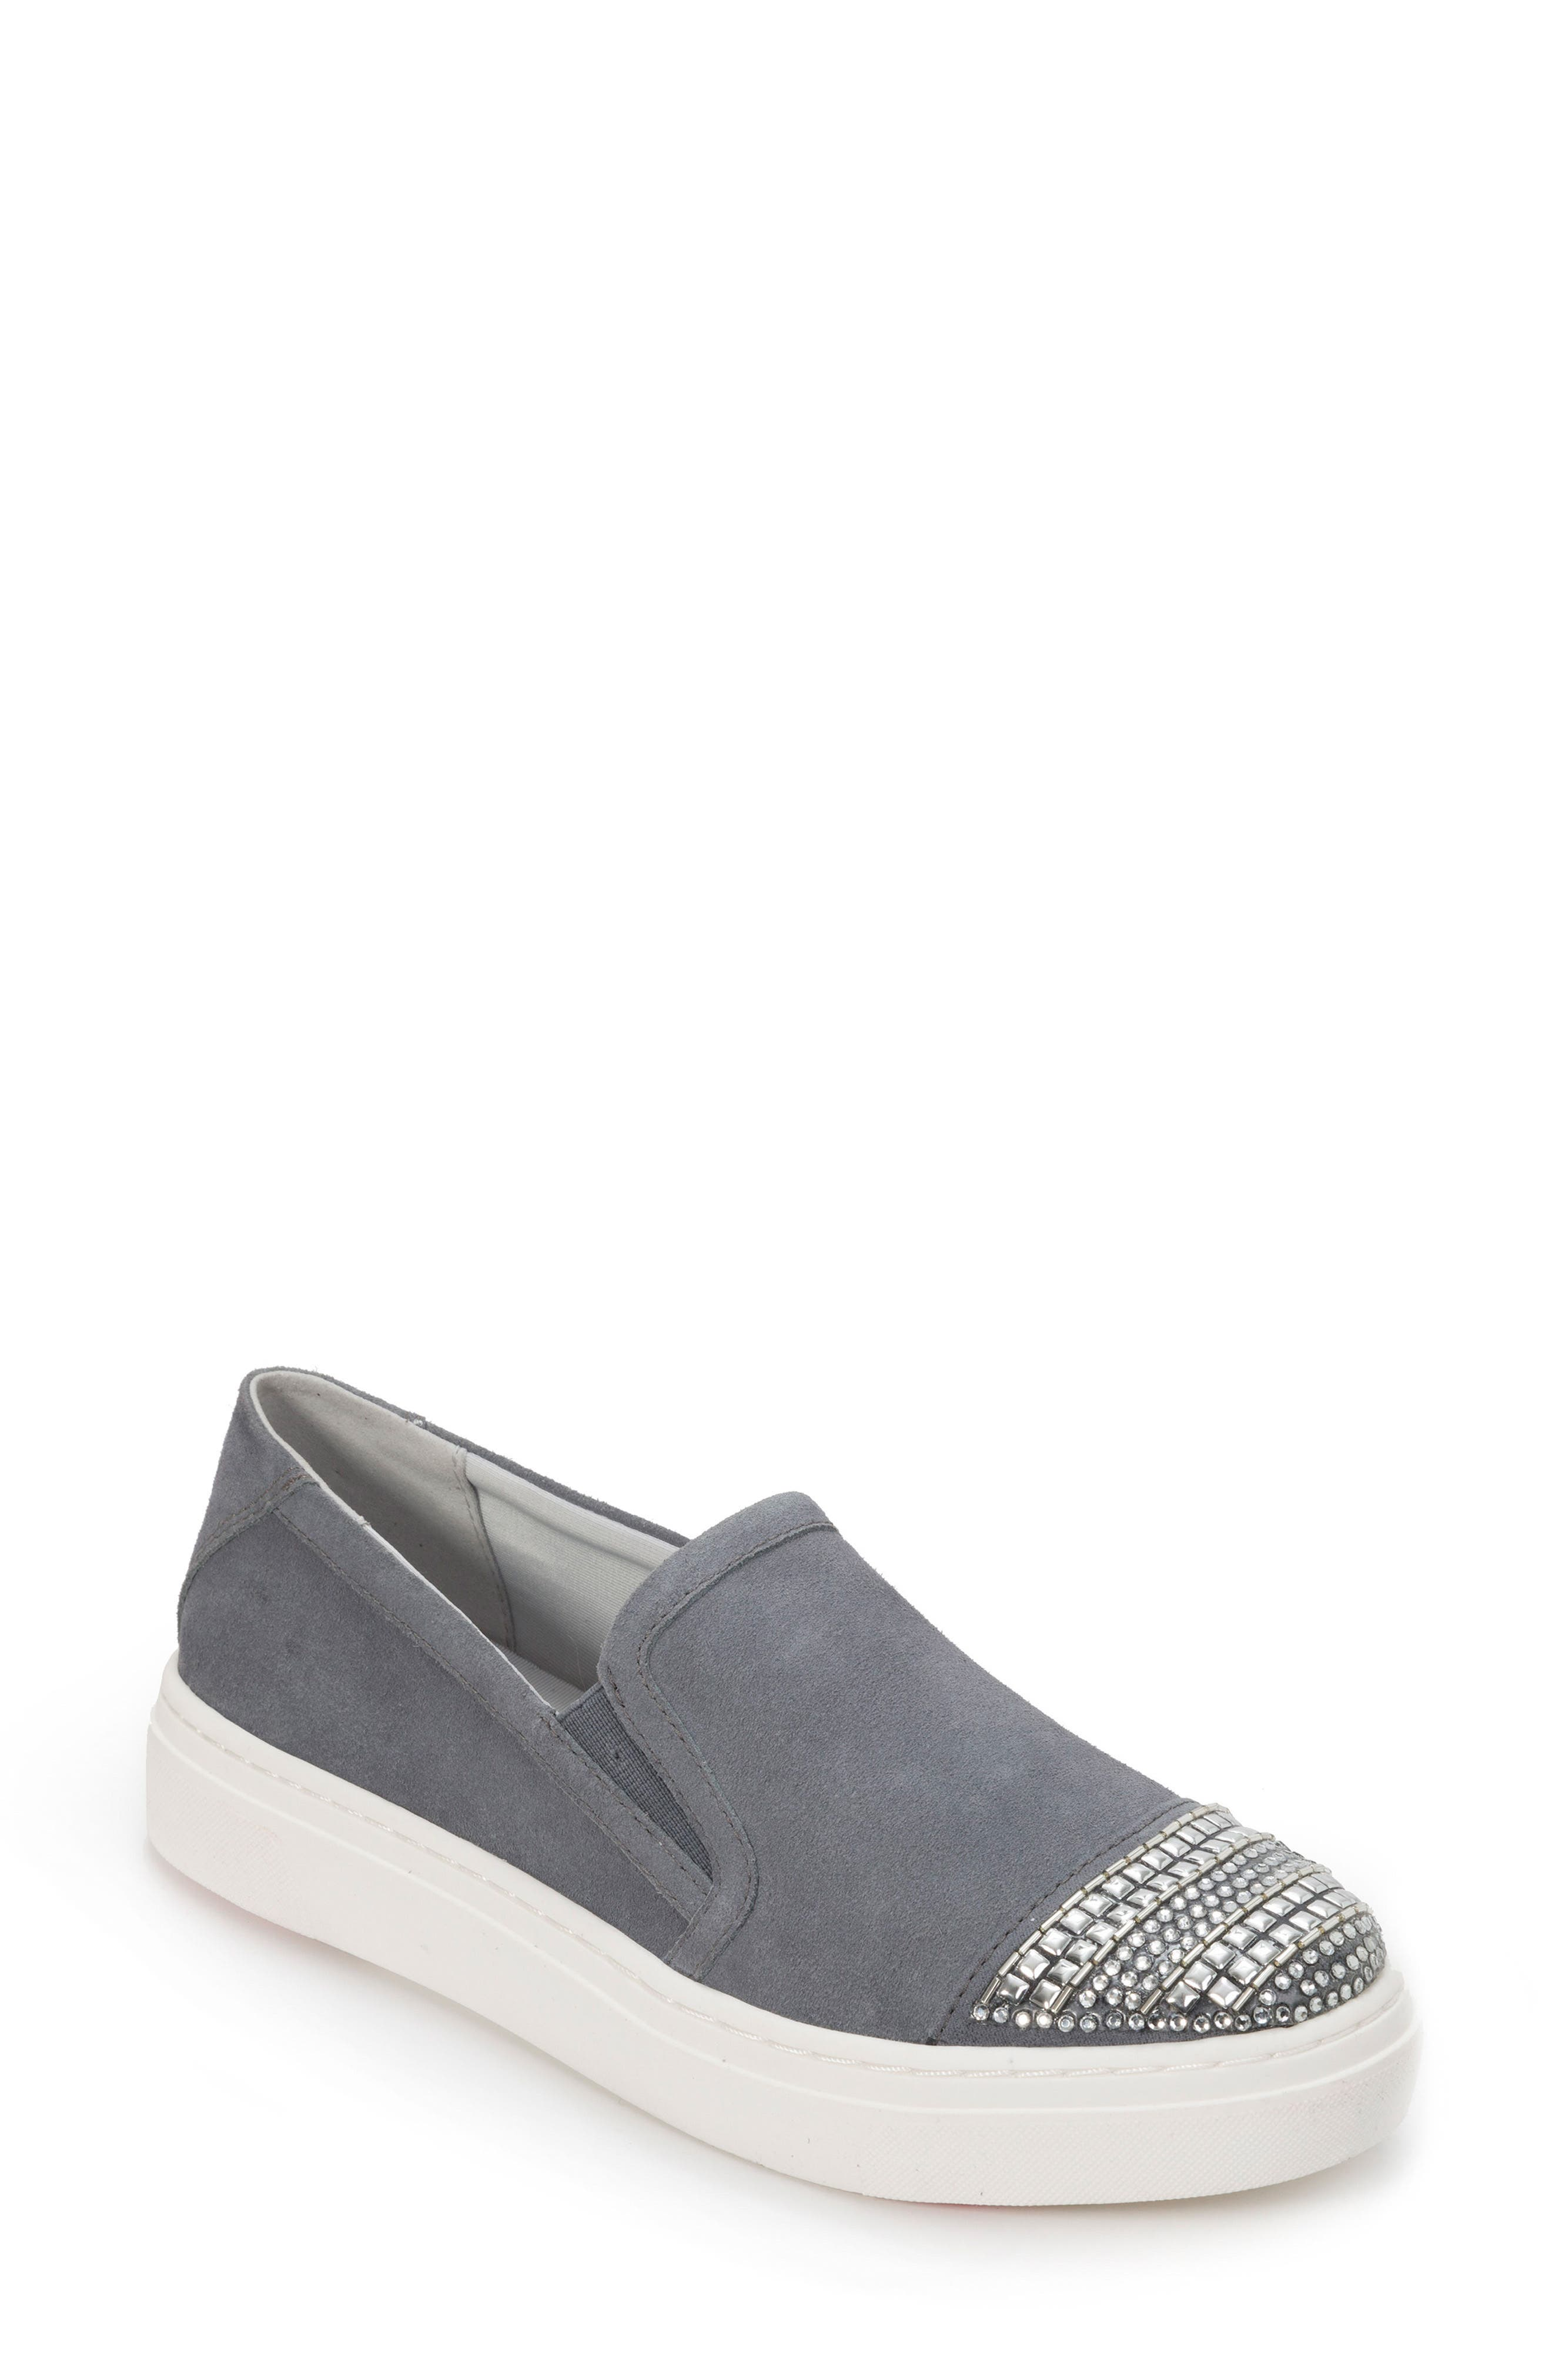 Finley Slip-On Sneaker,                         Main,                         color, DENIM BLUE SUEDE